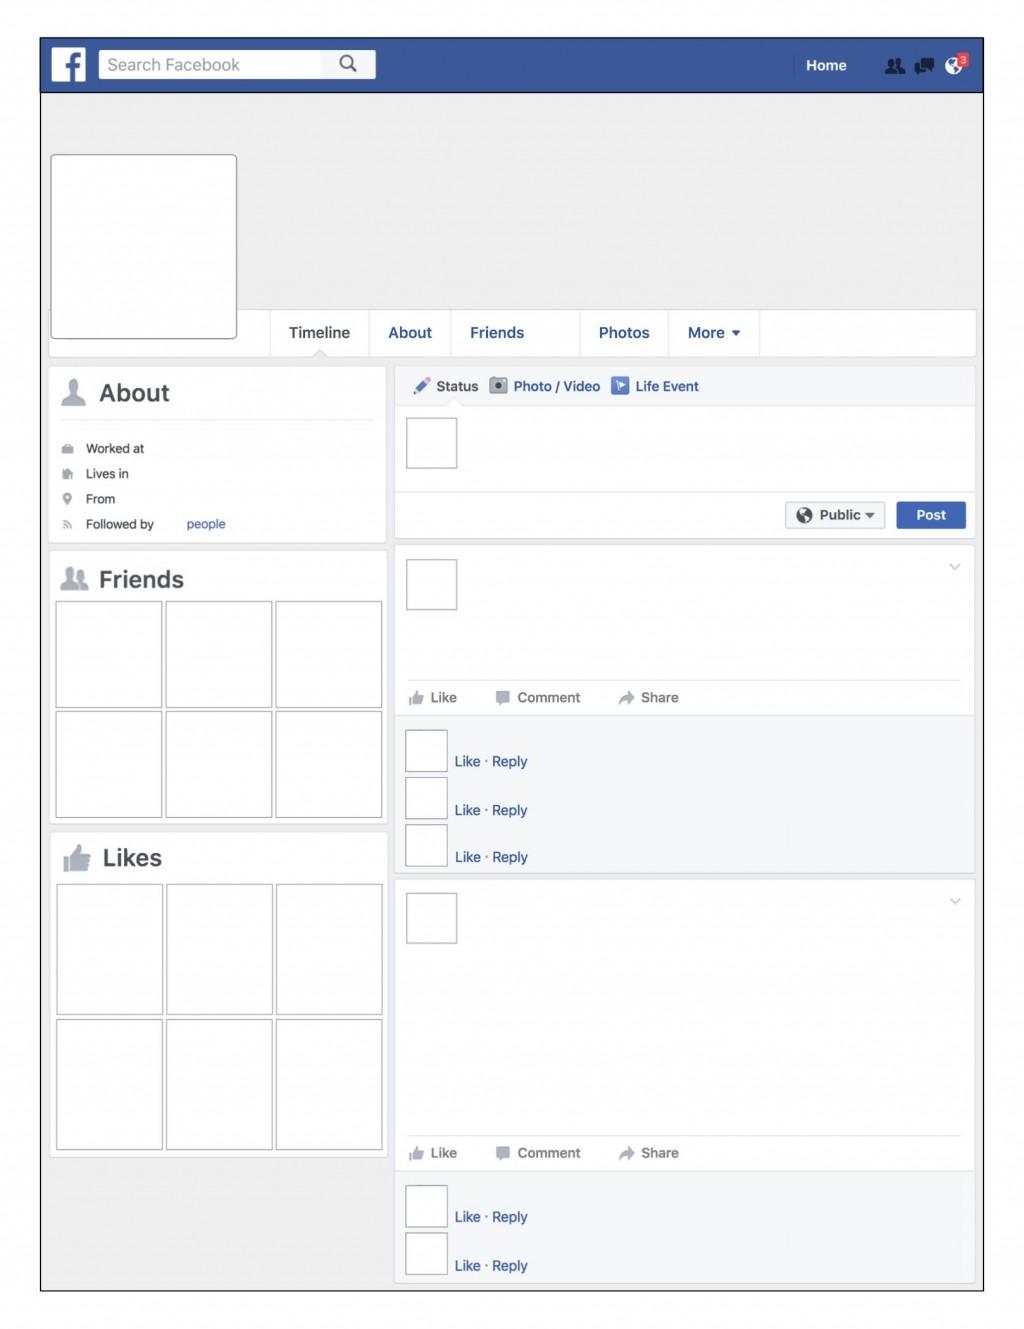 008 Fearsome Fake Facebook Page Template Idea  Busines Microsoft Word Create ALarge